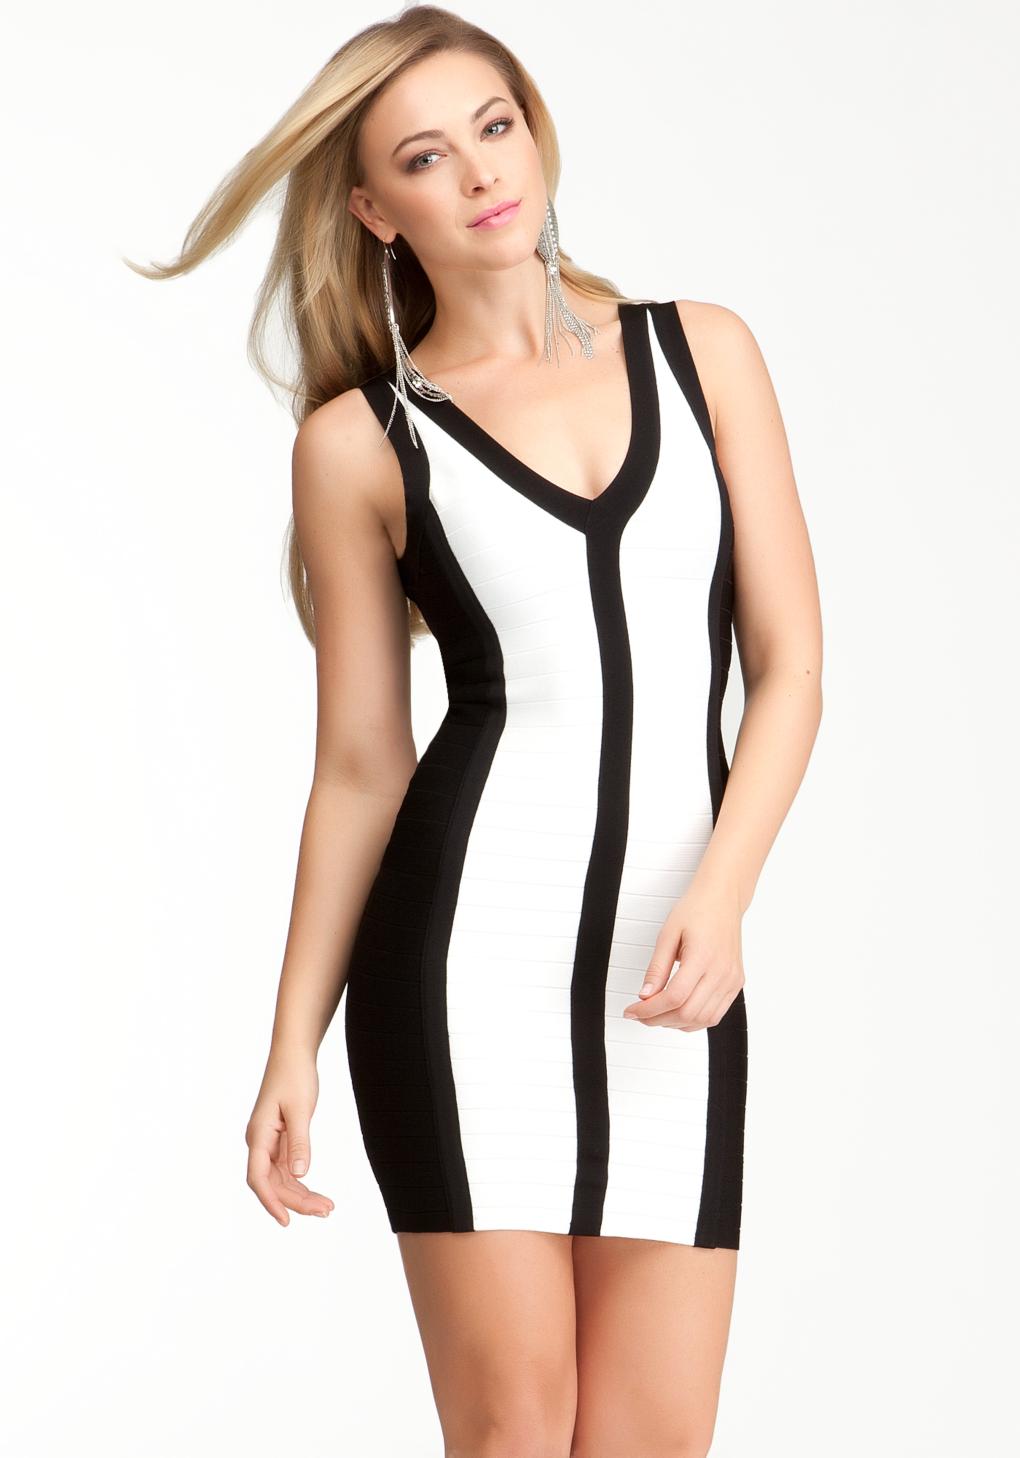 980c5873db bebe white and black dress – Little Black Dress   Black Lace ...